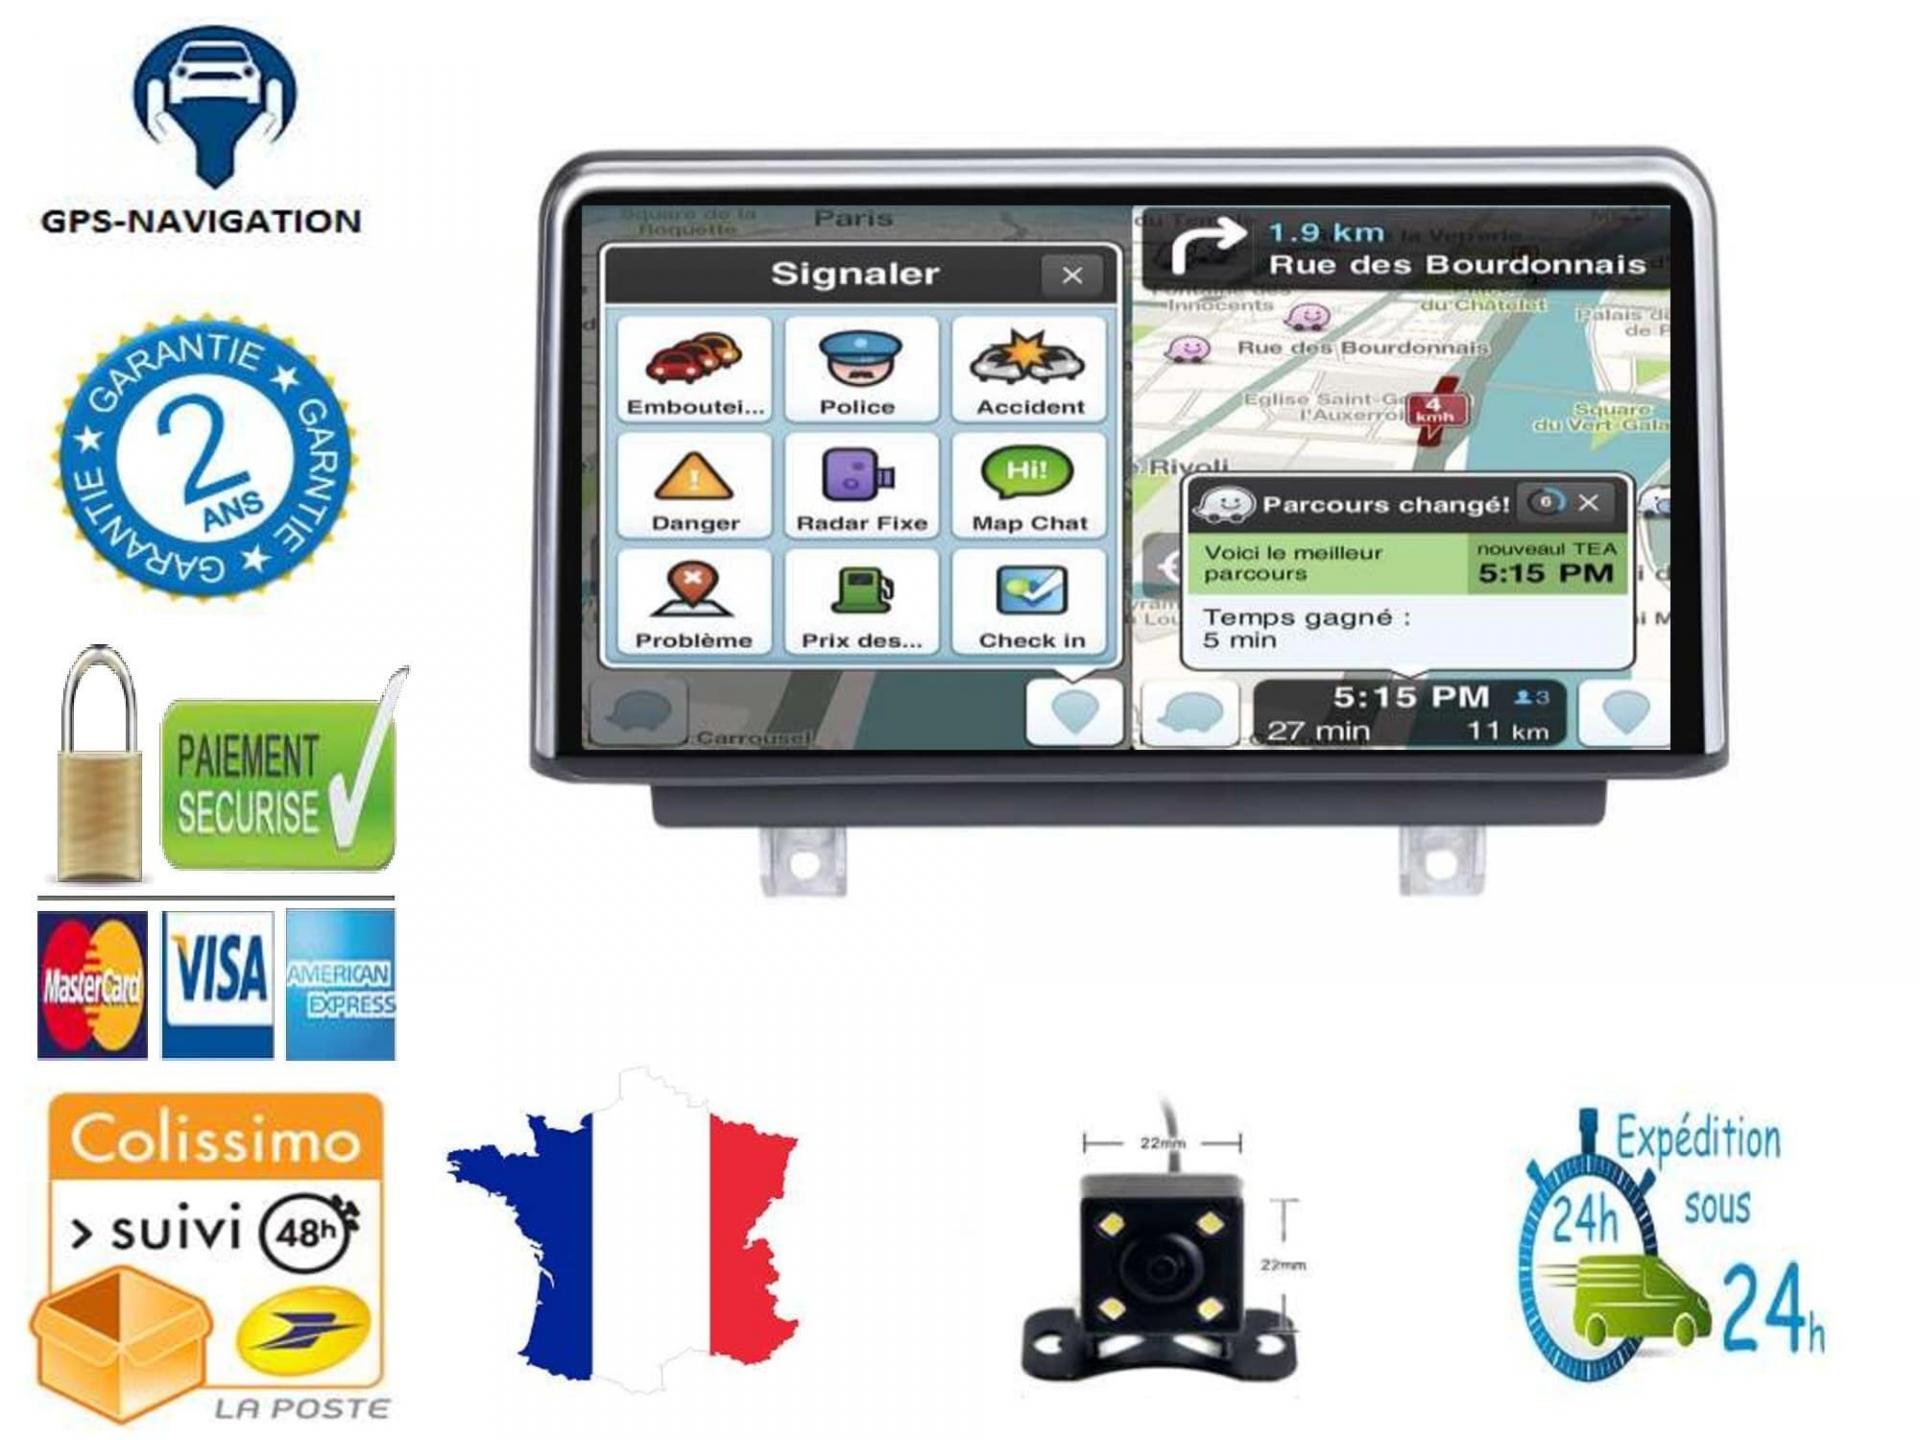 Bmw gps carplay android auto gps bluetooth 4